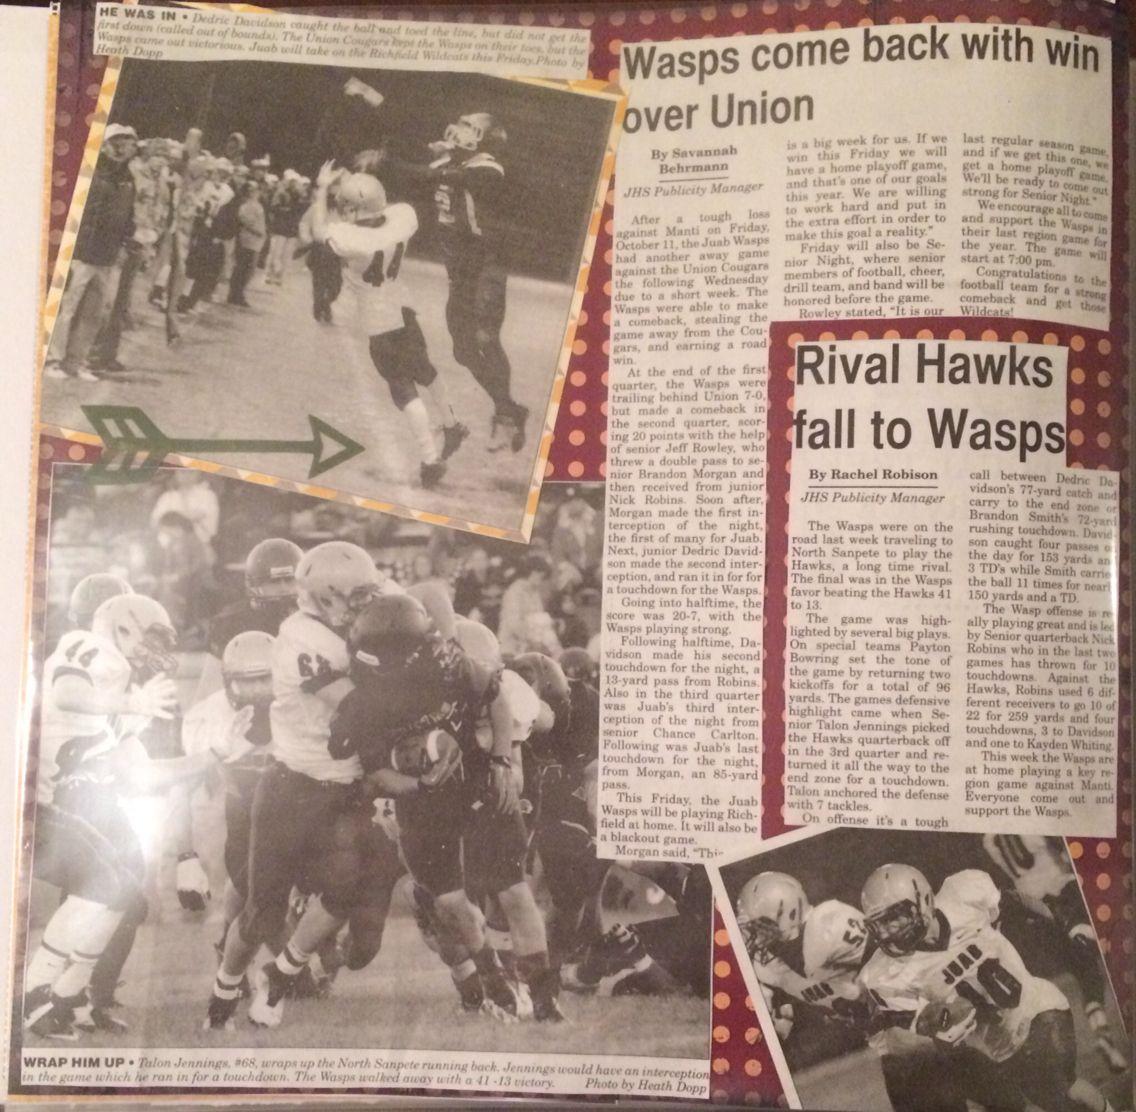 Graduation scrapbook ideas pinterest - Sports Scrapbook Scrapbook With Newspaper Clippings Football Scrapbook Layouts